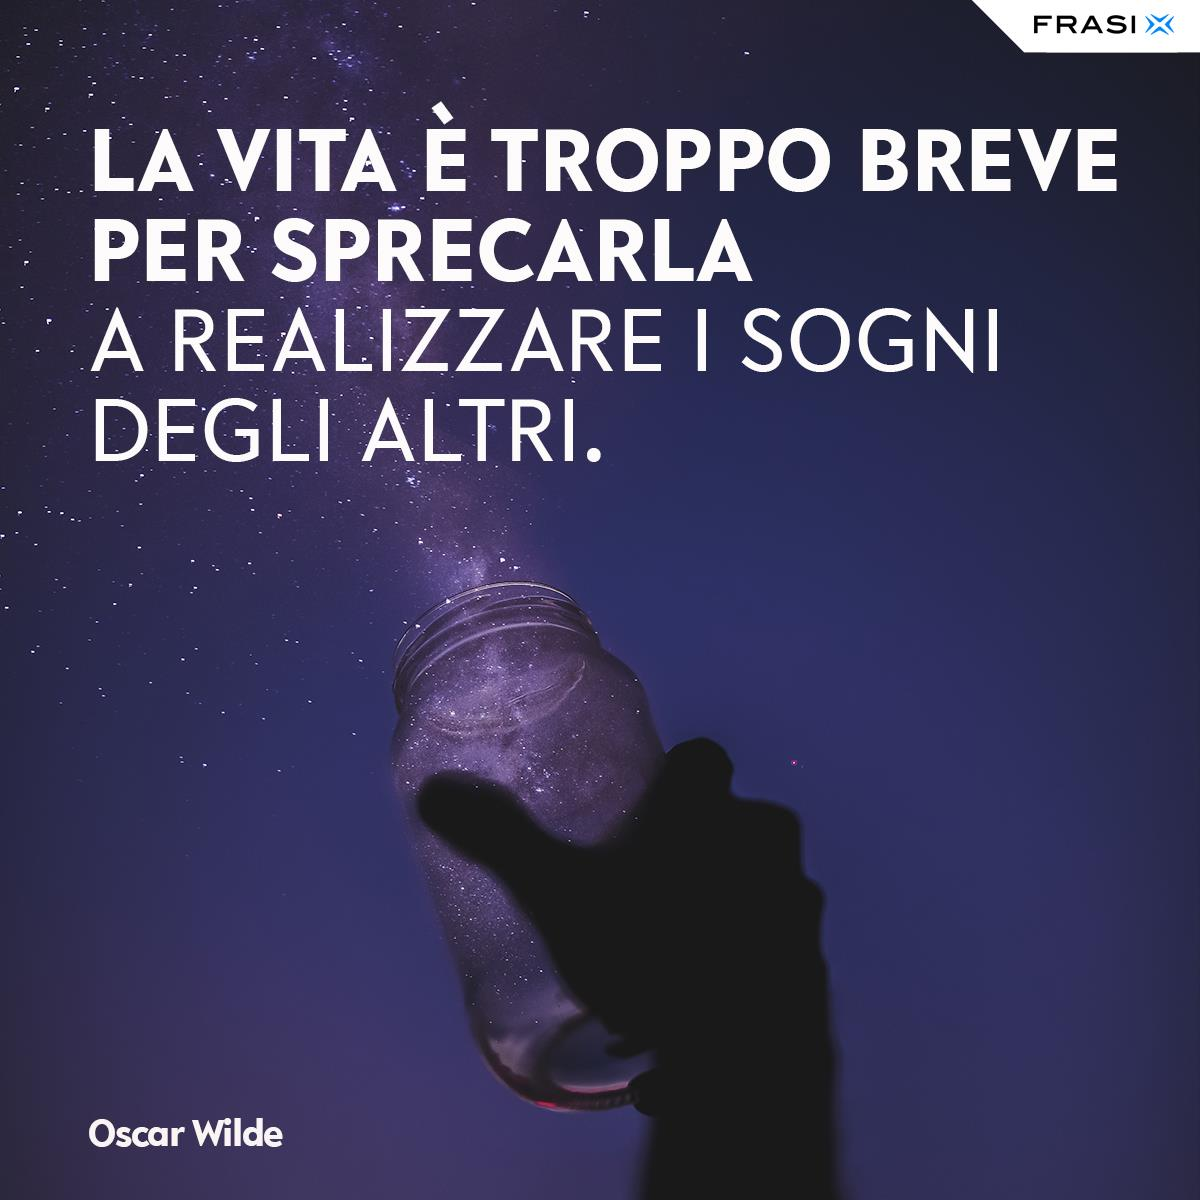 Frasi sul tempo libri Oscar Wilde